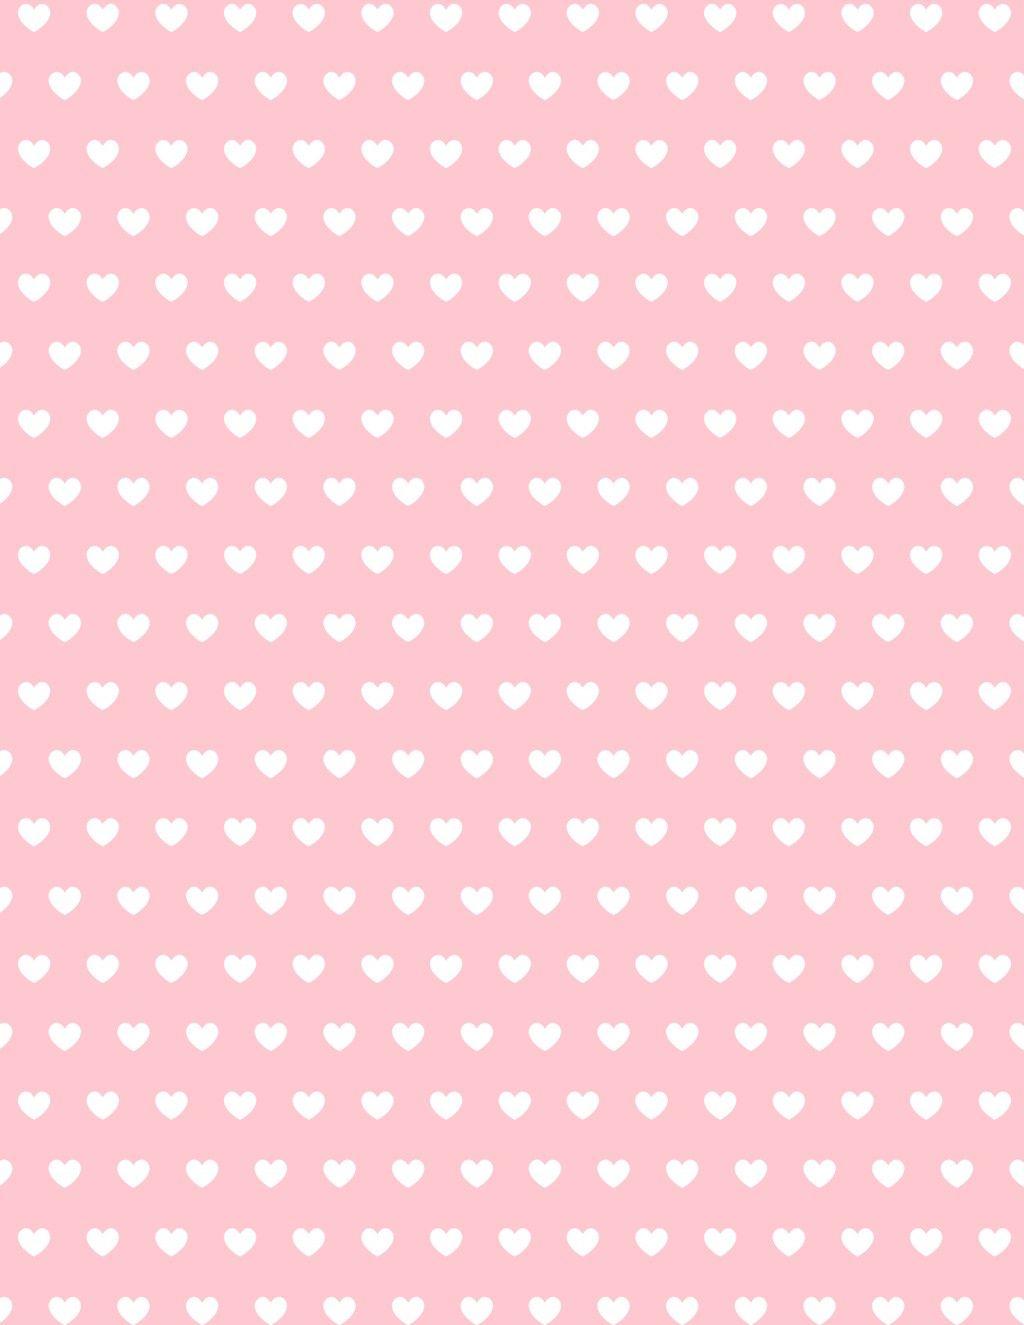 Free Valentine Hearts Scrapbook Paper | Perfect Student - Free Printable Scrapbook Paper Designs